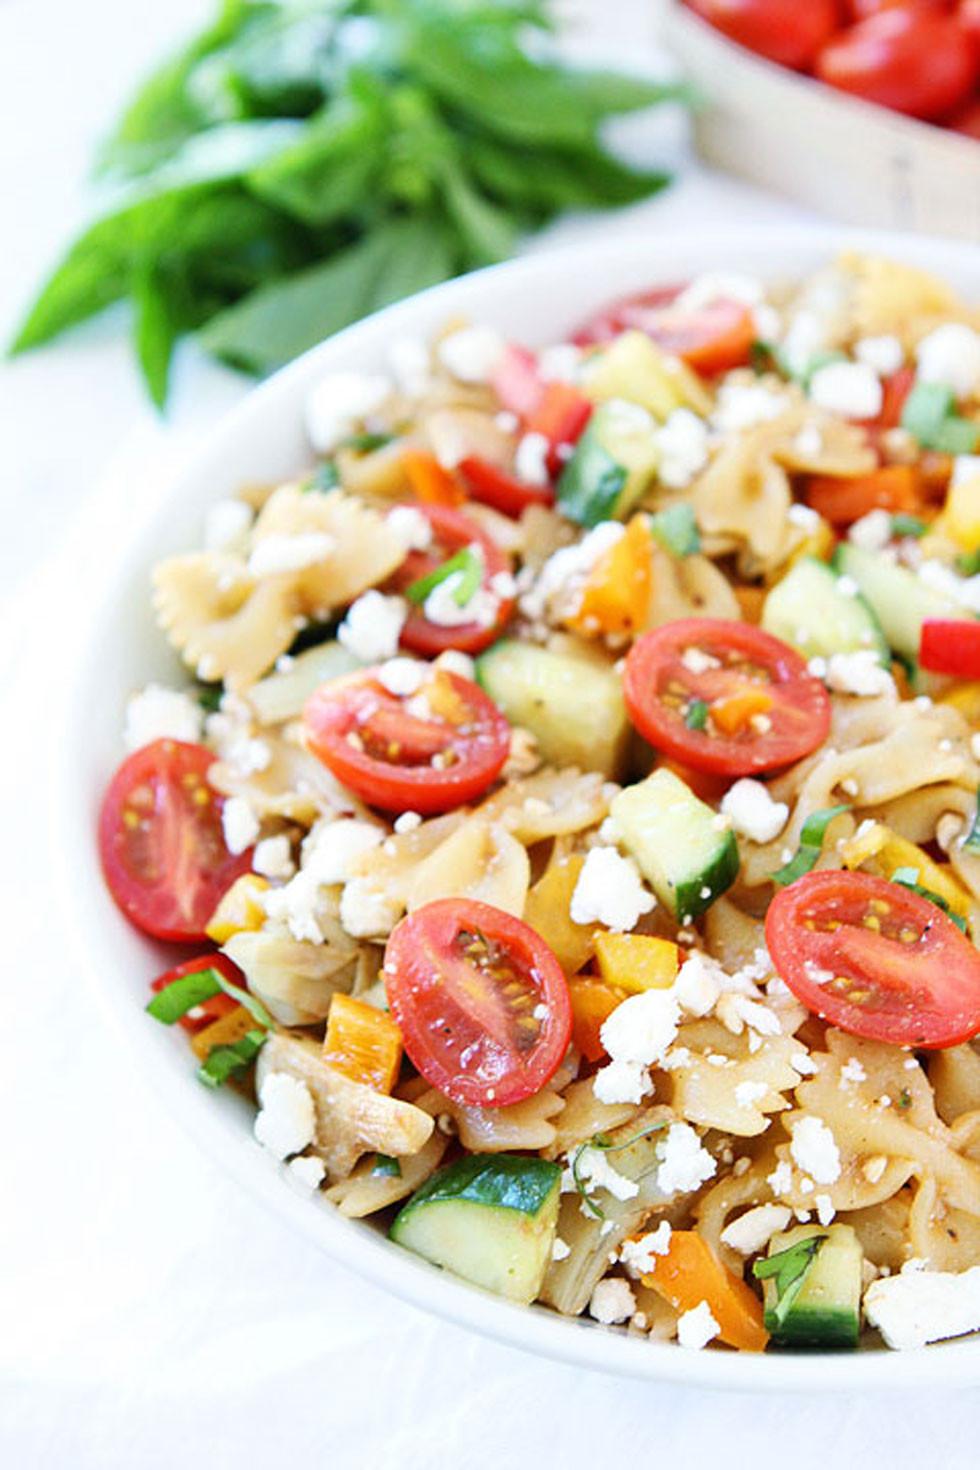 Summer Main Dish Salads  Easy main dish summer salad recipes Food easy recipes